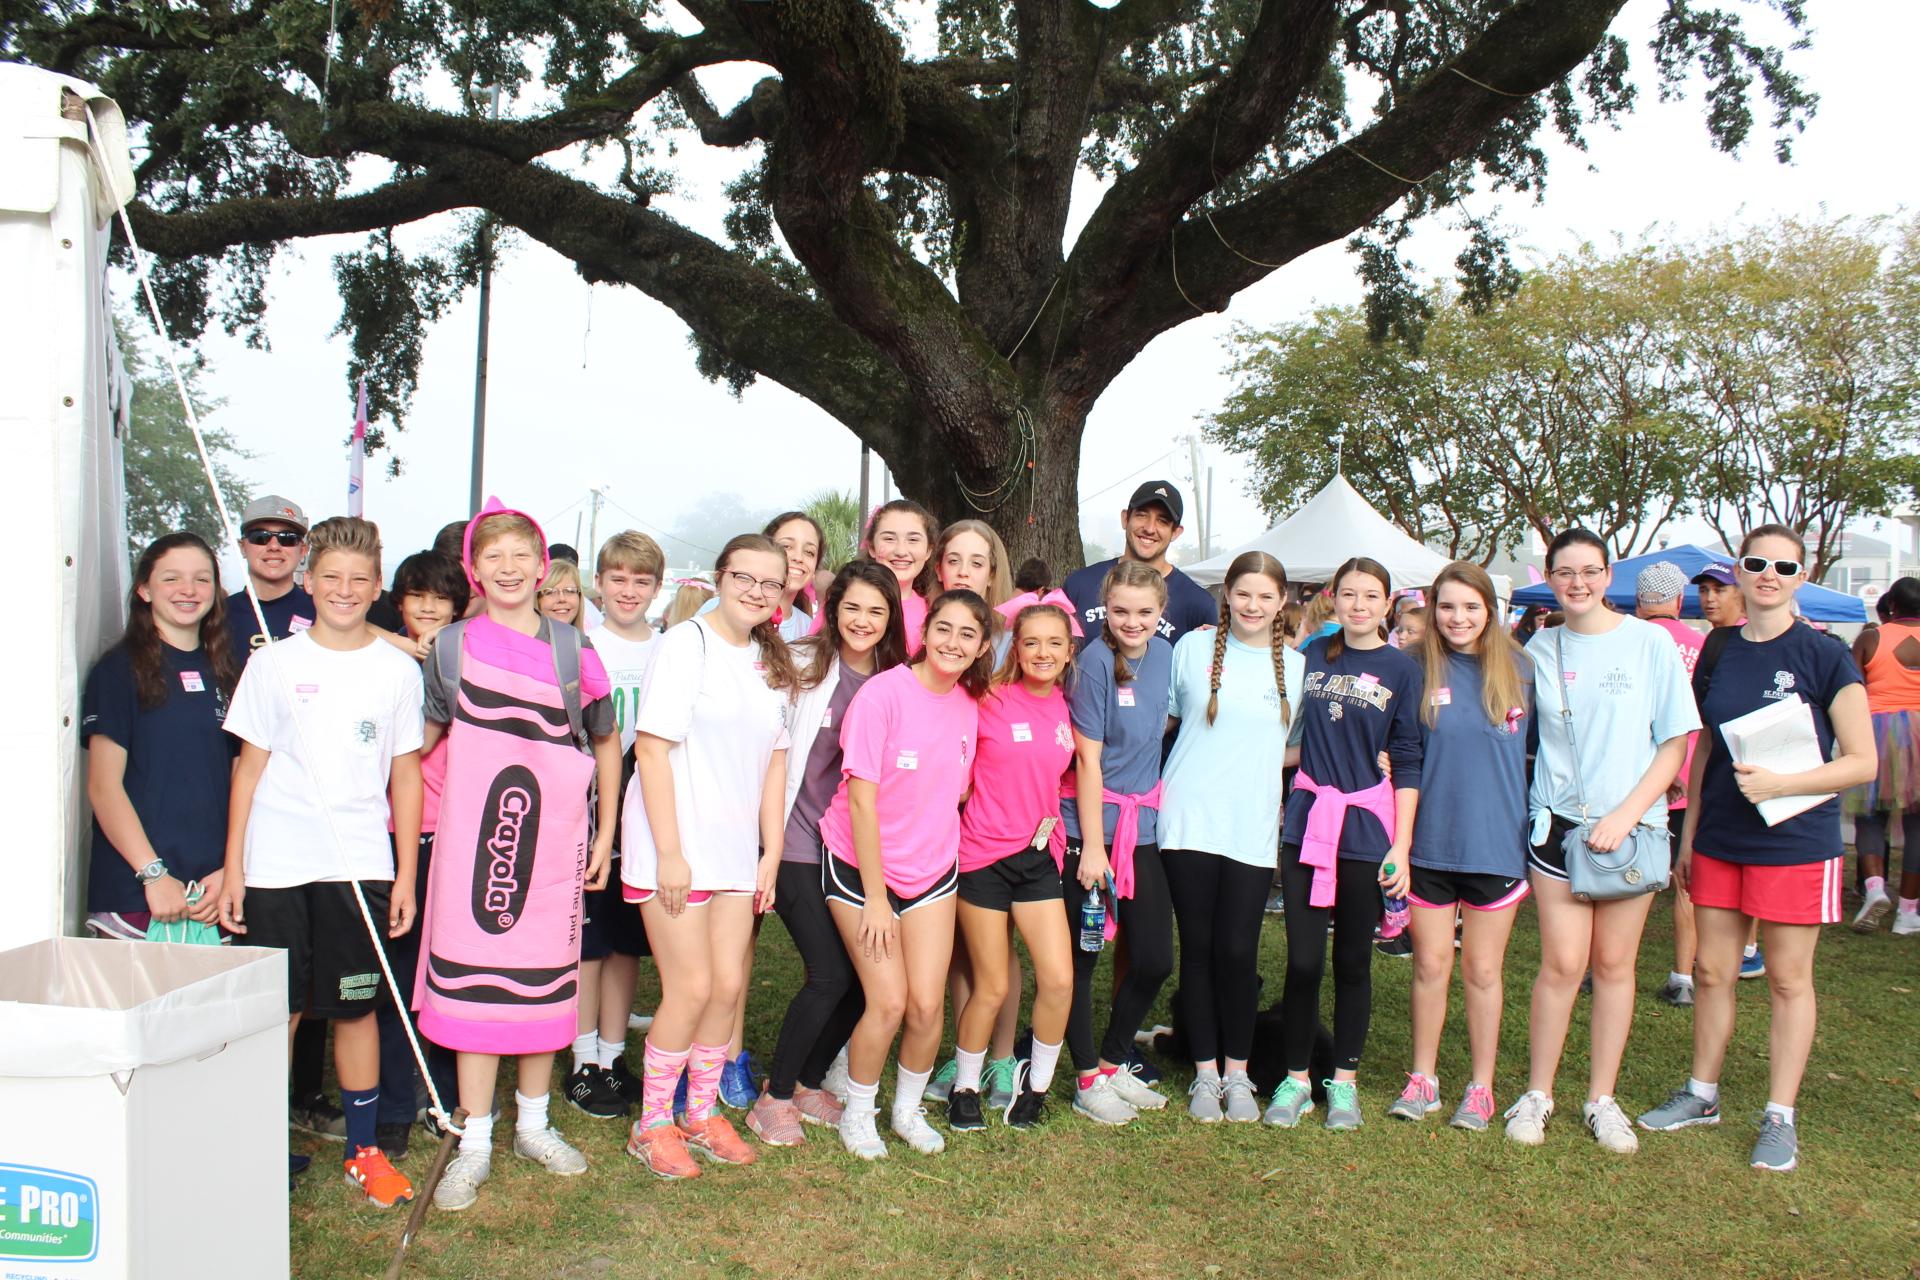 NJHS makes strides against breast cancer